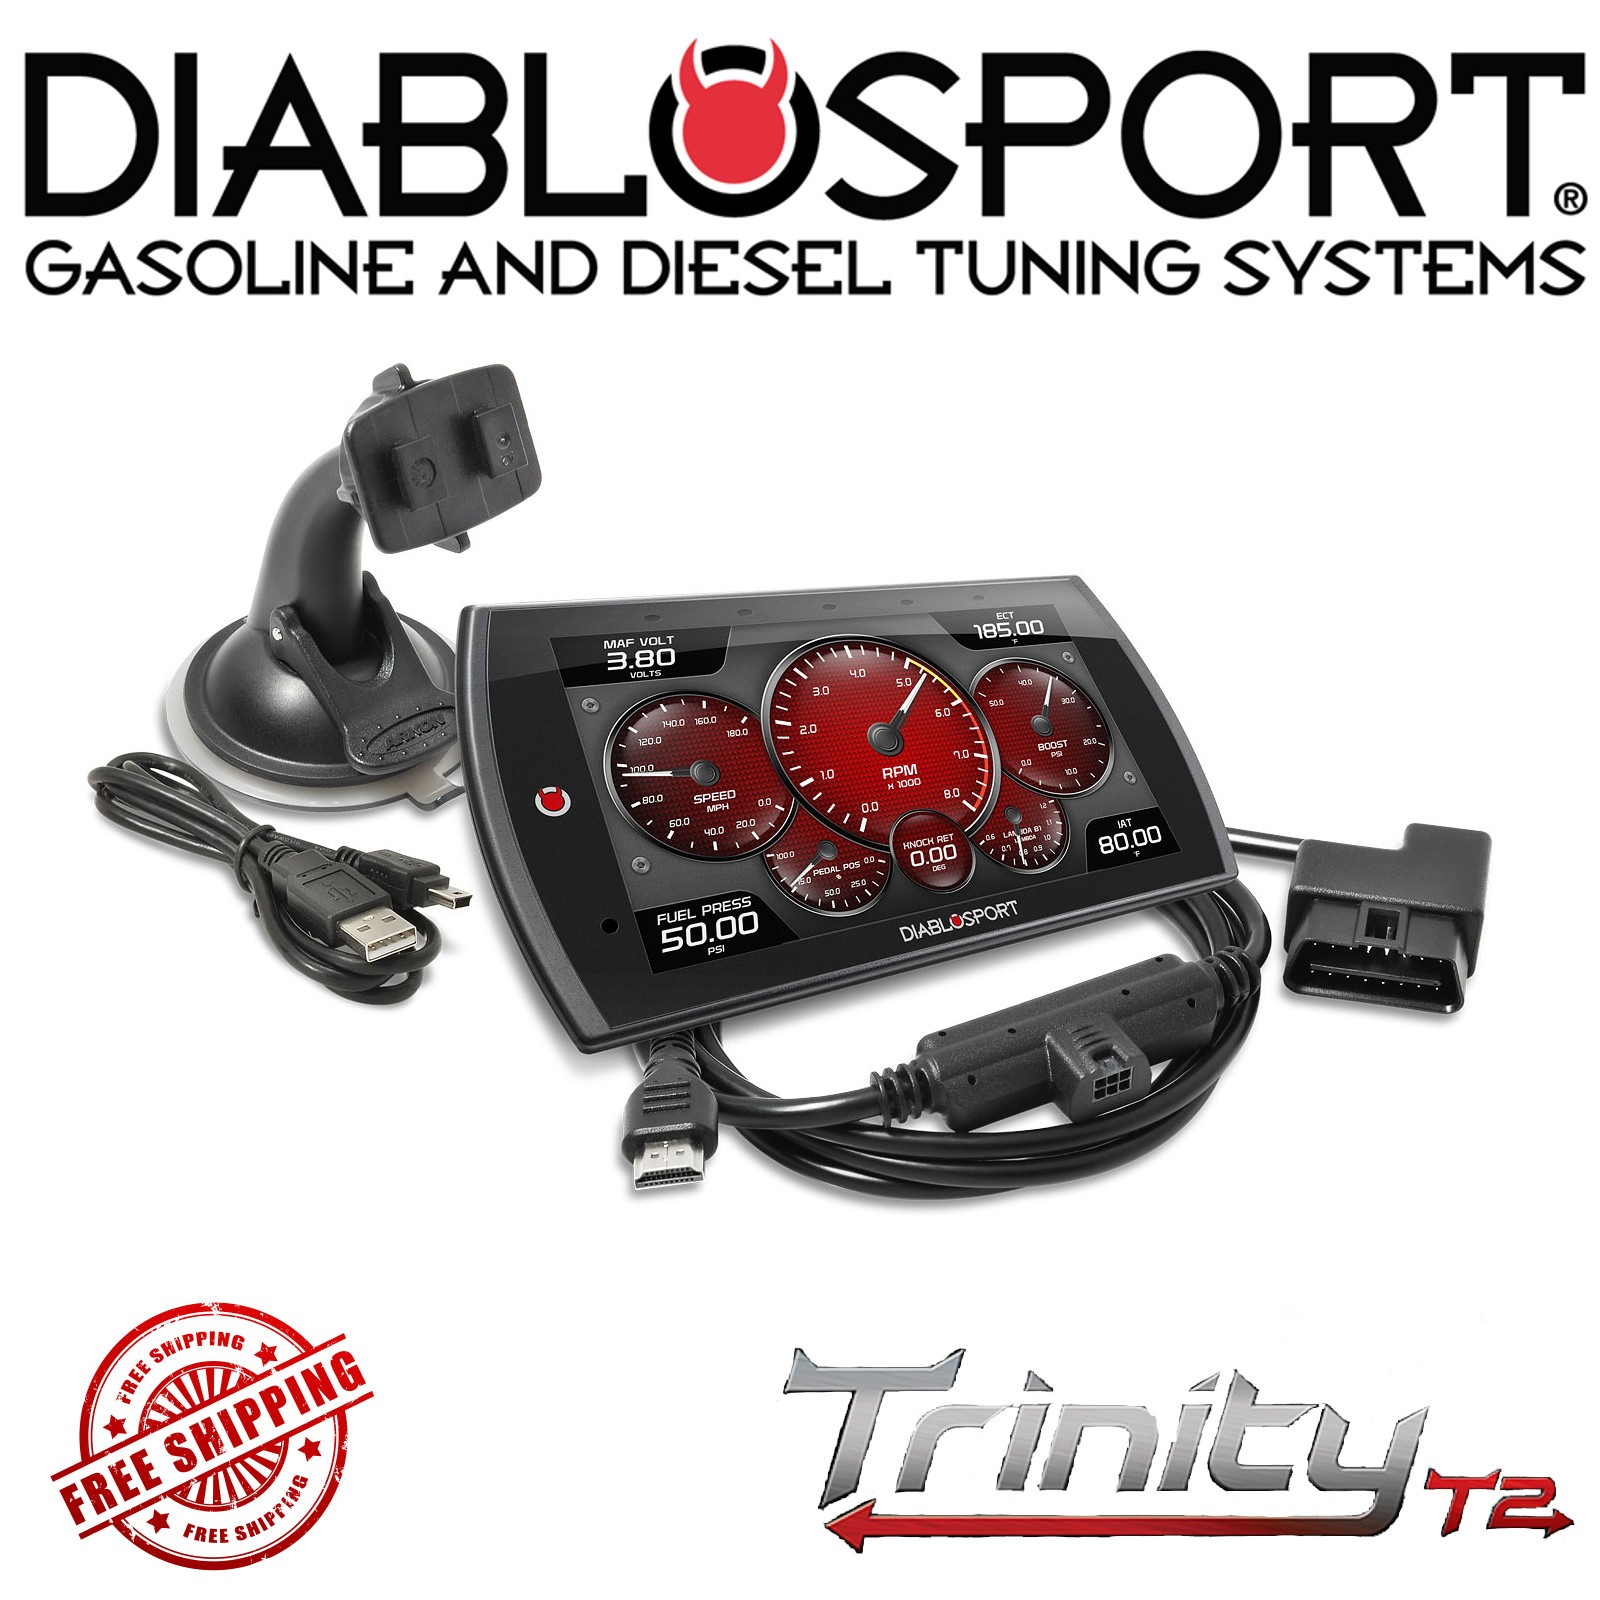 2.0 L Ecoboost >> Details About Diablosport Trinity T2 Ex Platinum Tuner Monitor 13 16 Ford Focus 2 0l Ecoboost